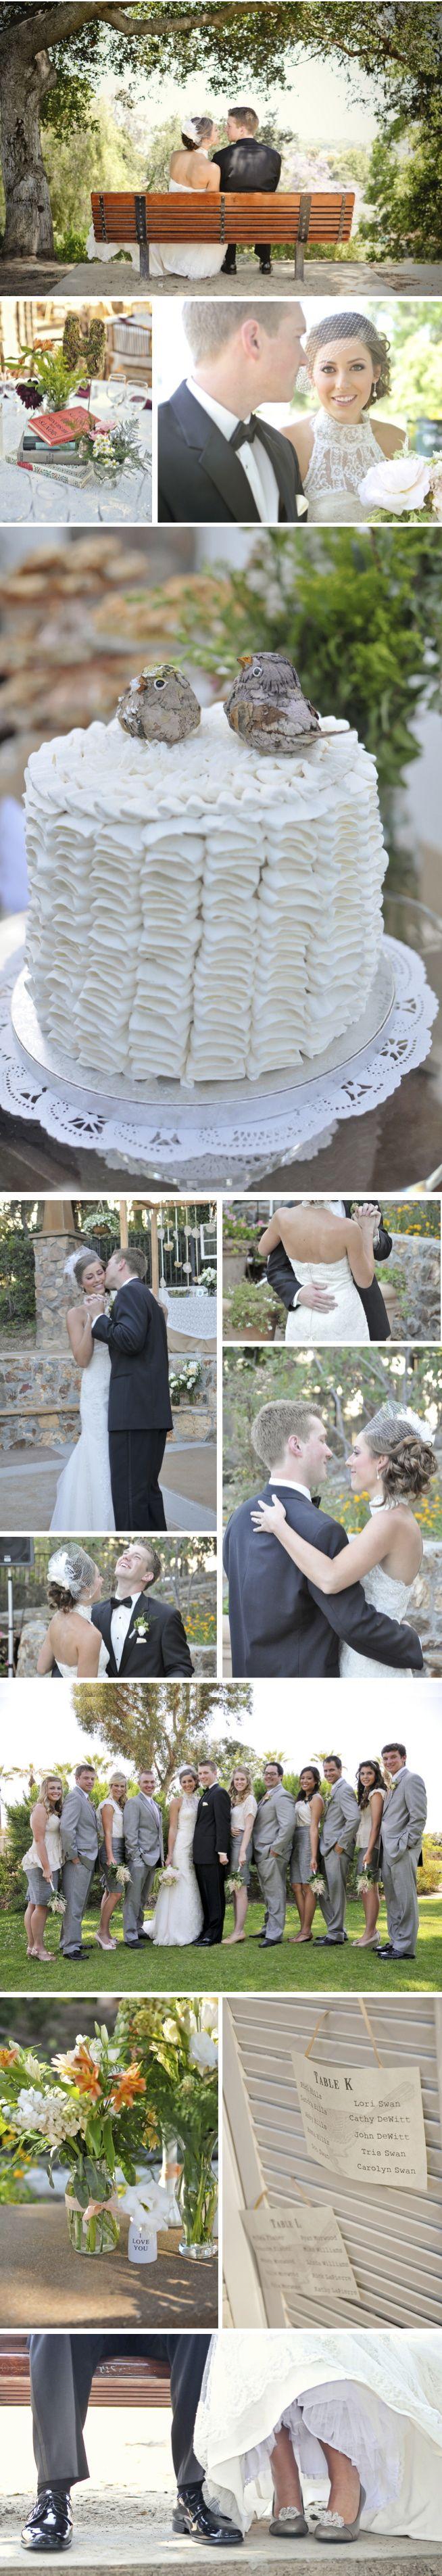 .Ideas Features, Wedding Ideas, Magazines Blog, Smitten Magazines